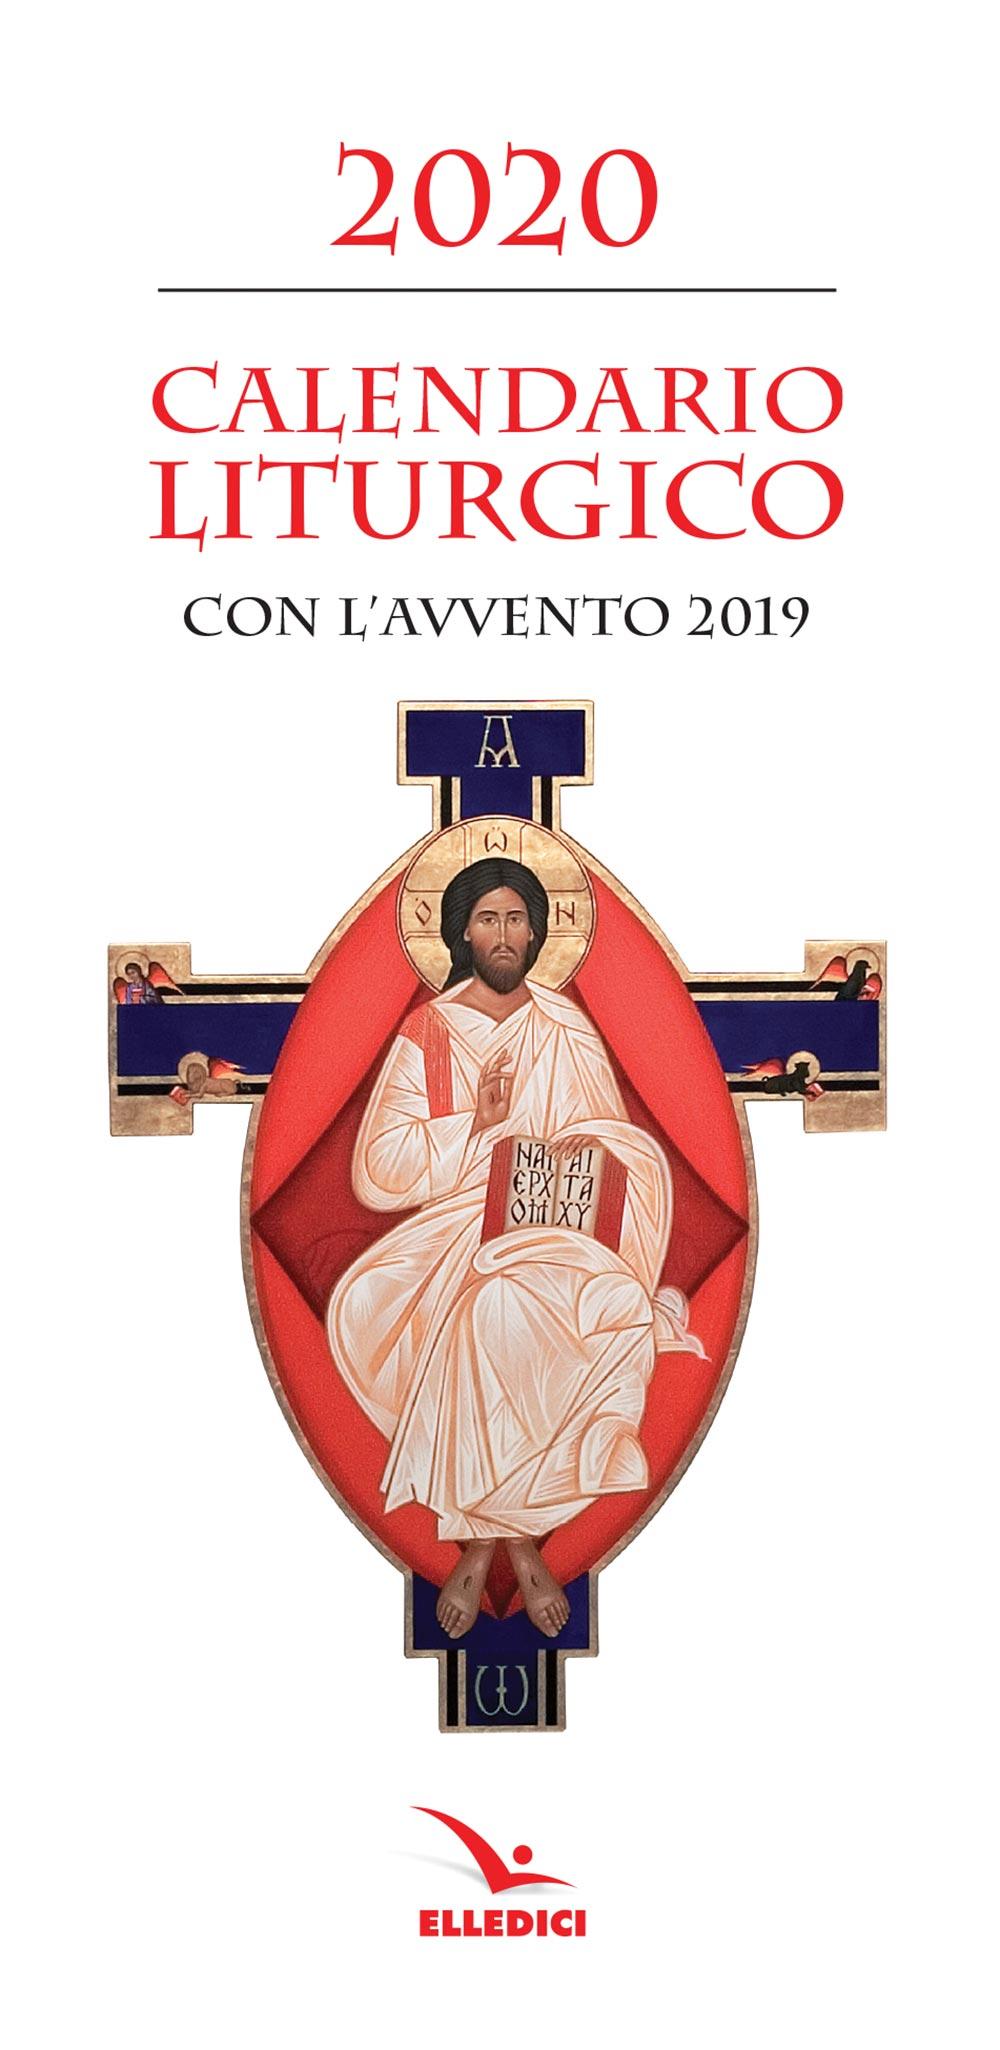 Calendario Liturgico Romano 2020.Calendario Liturgico 2020